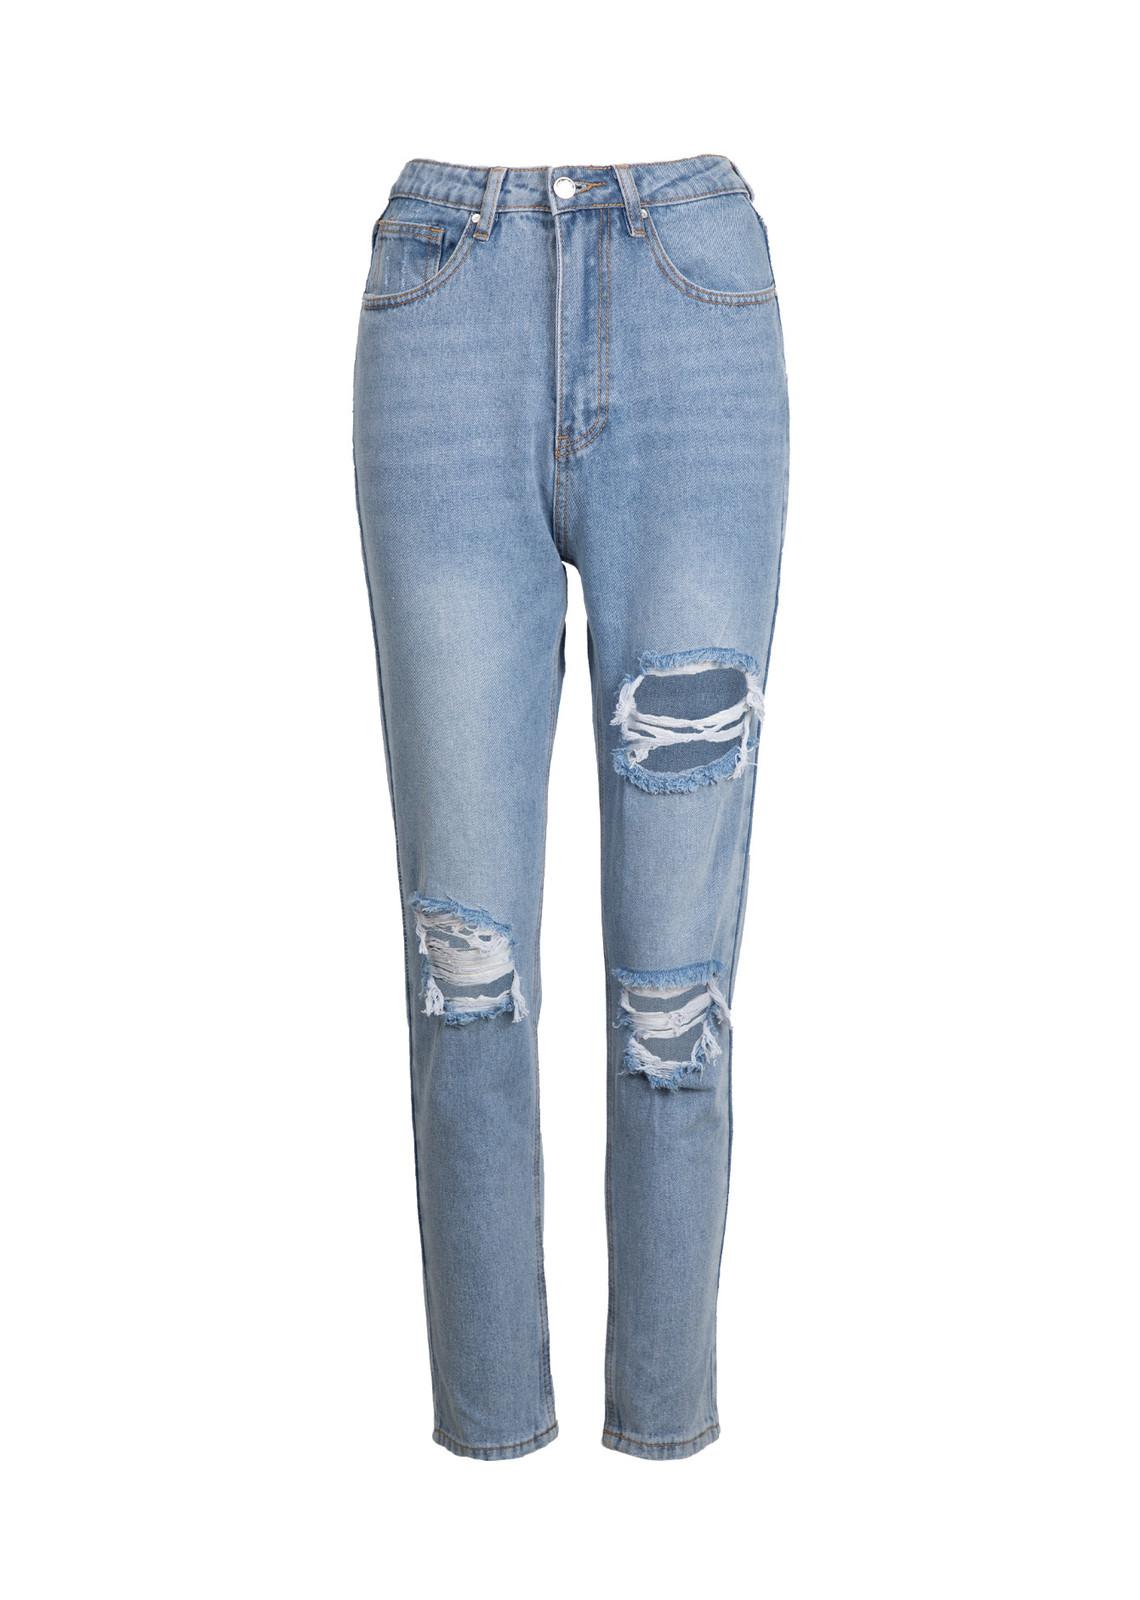 Cut out jeans Brianna